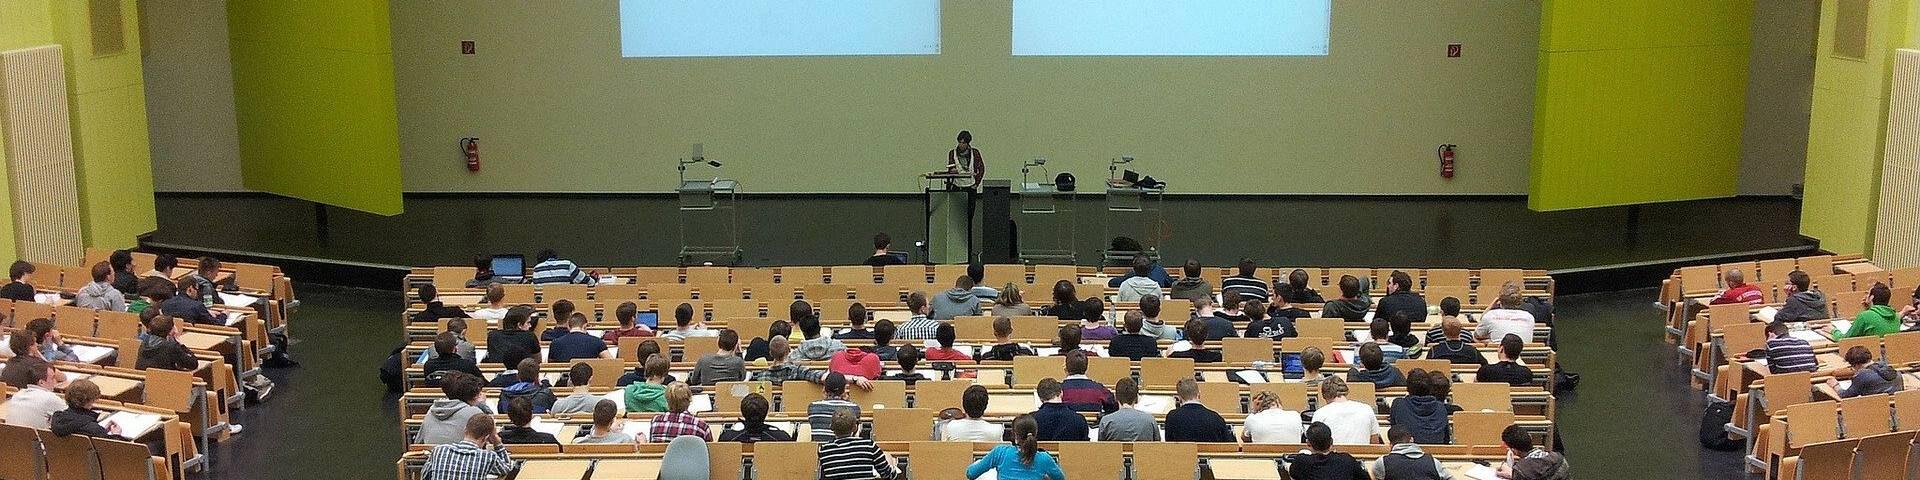 Private-Hochschulen